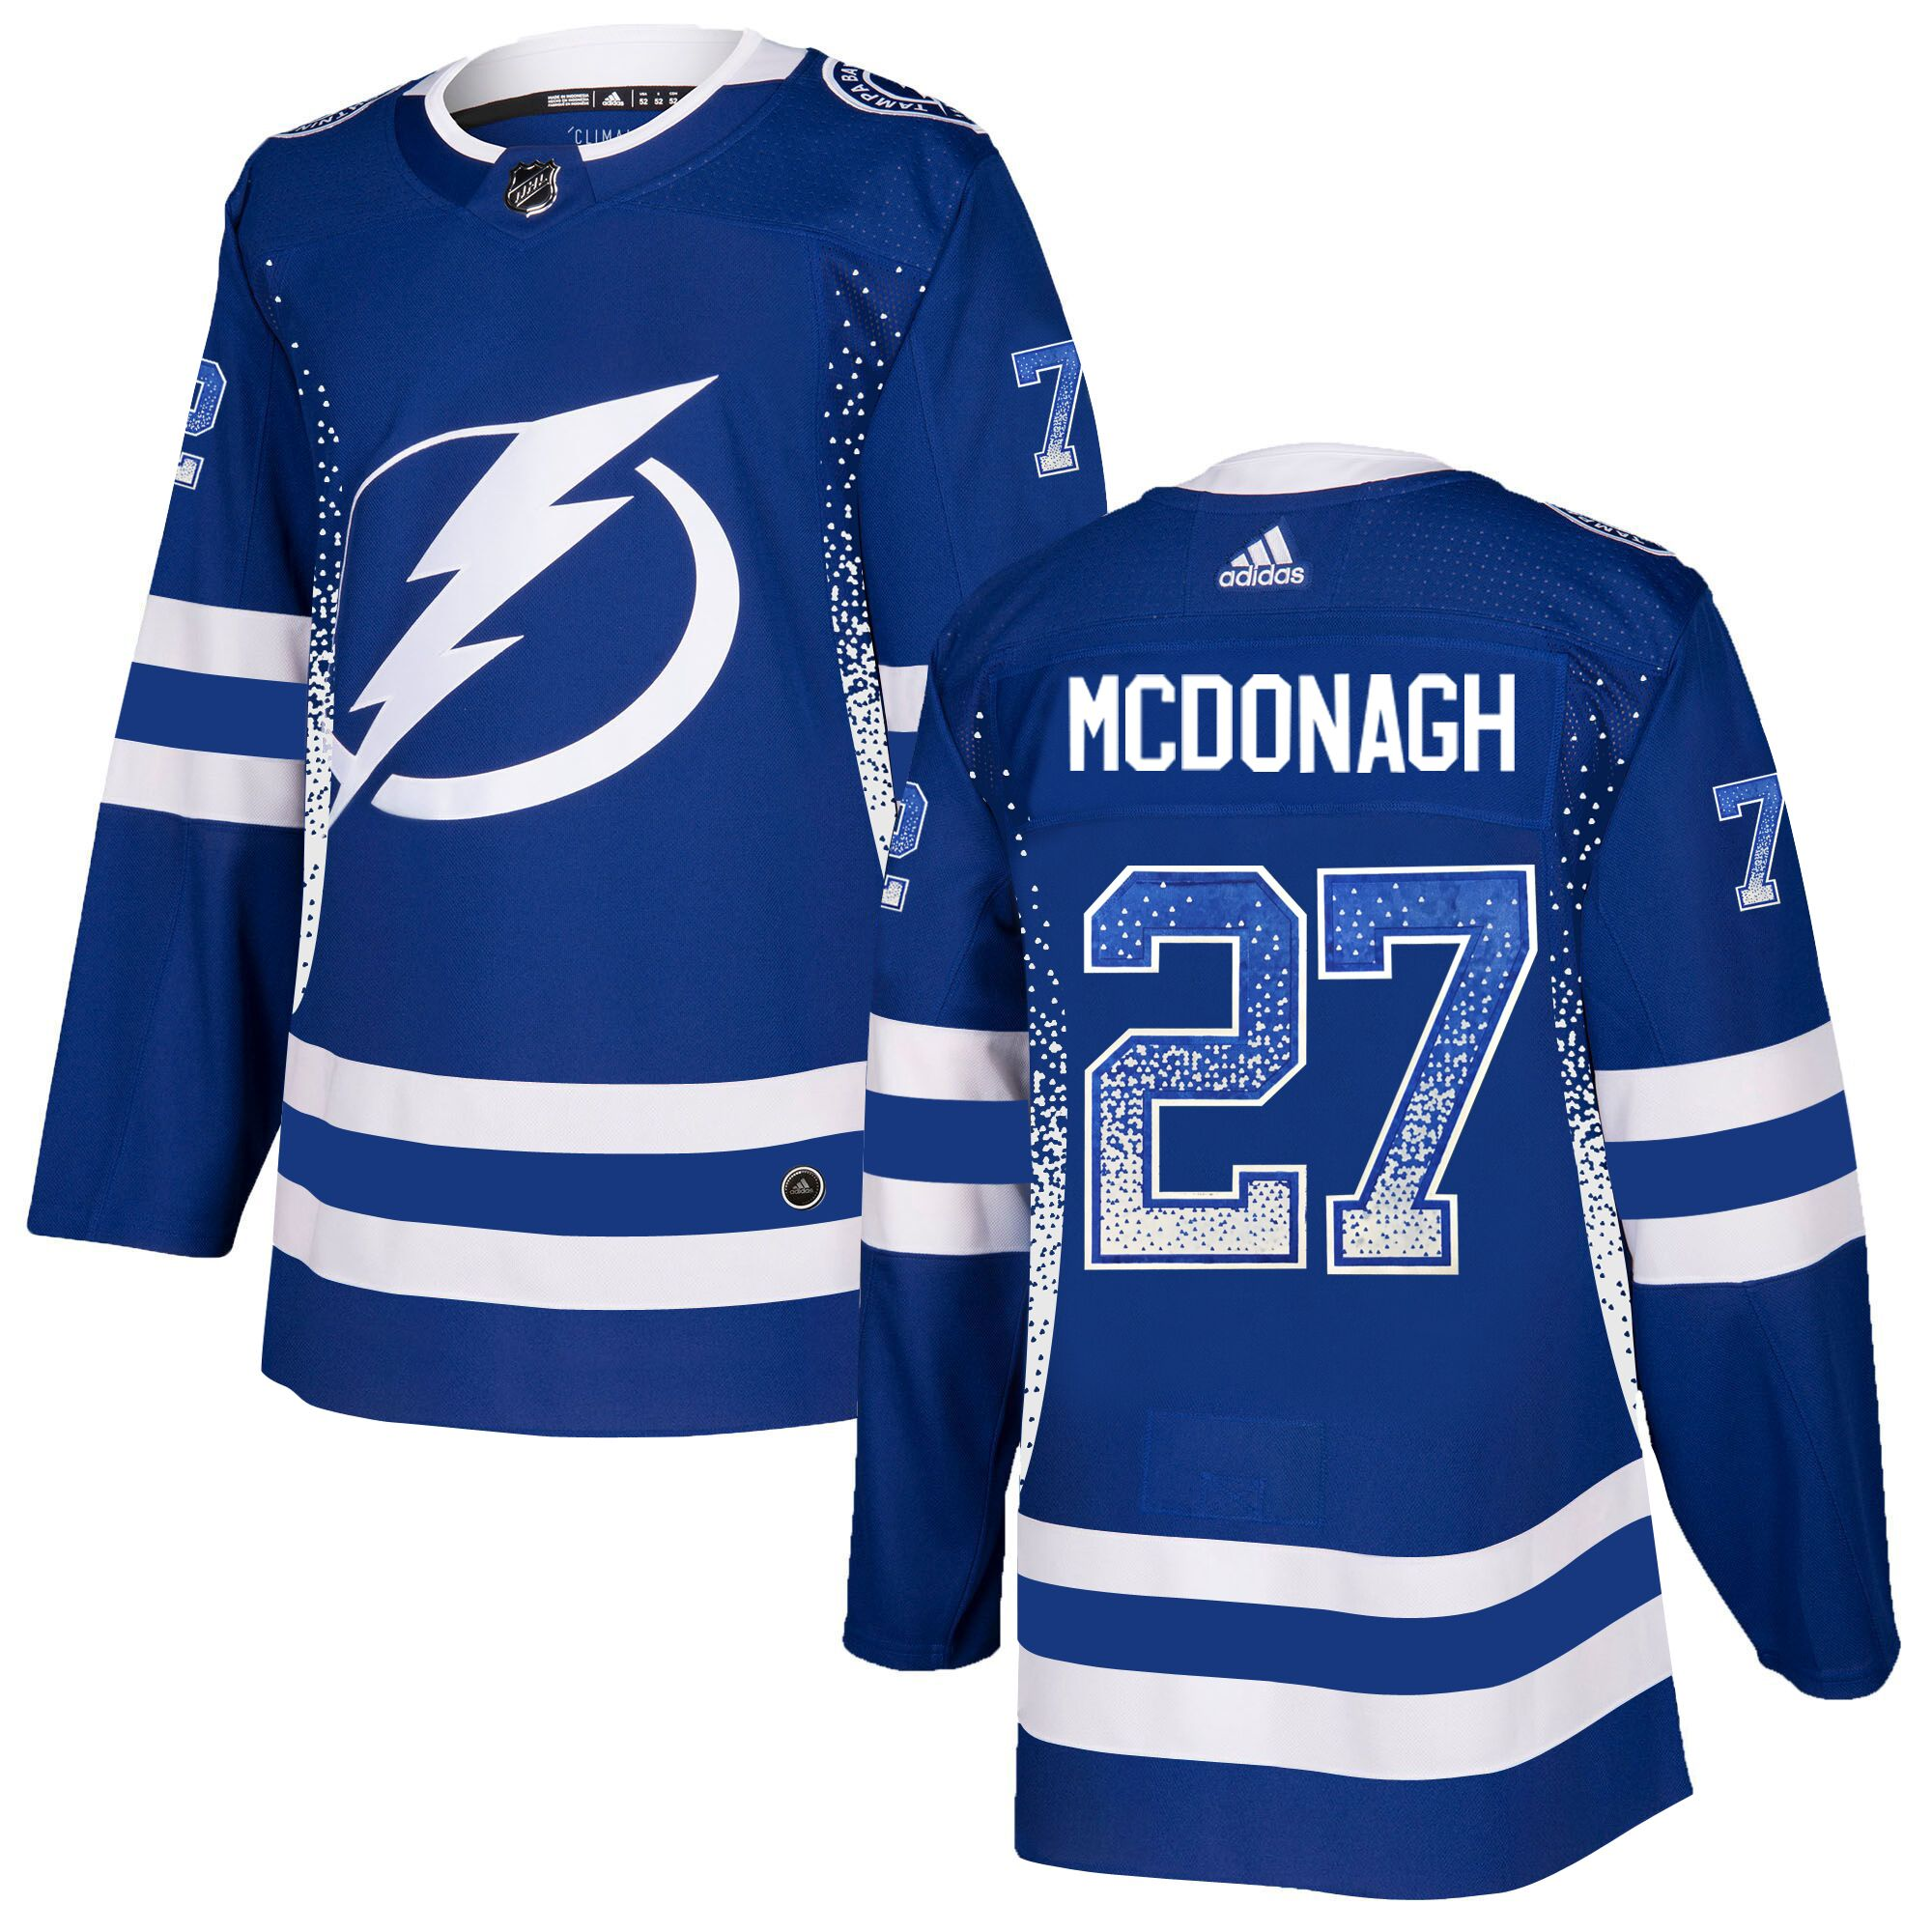 Lightning 27 Ryan McDonagh Blue Drift Fashion Adidas Jersey